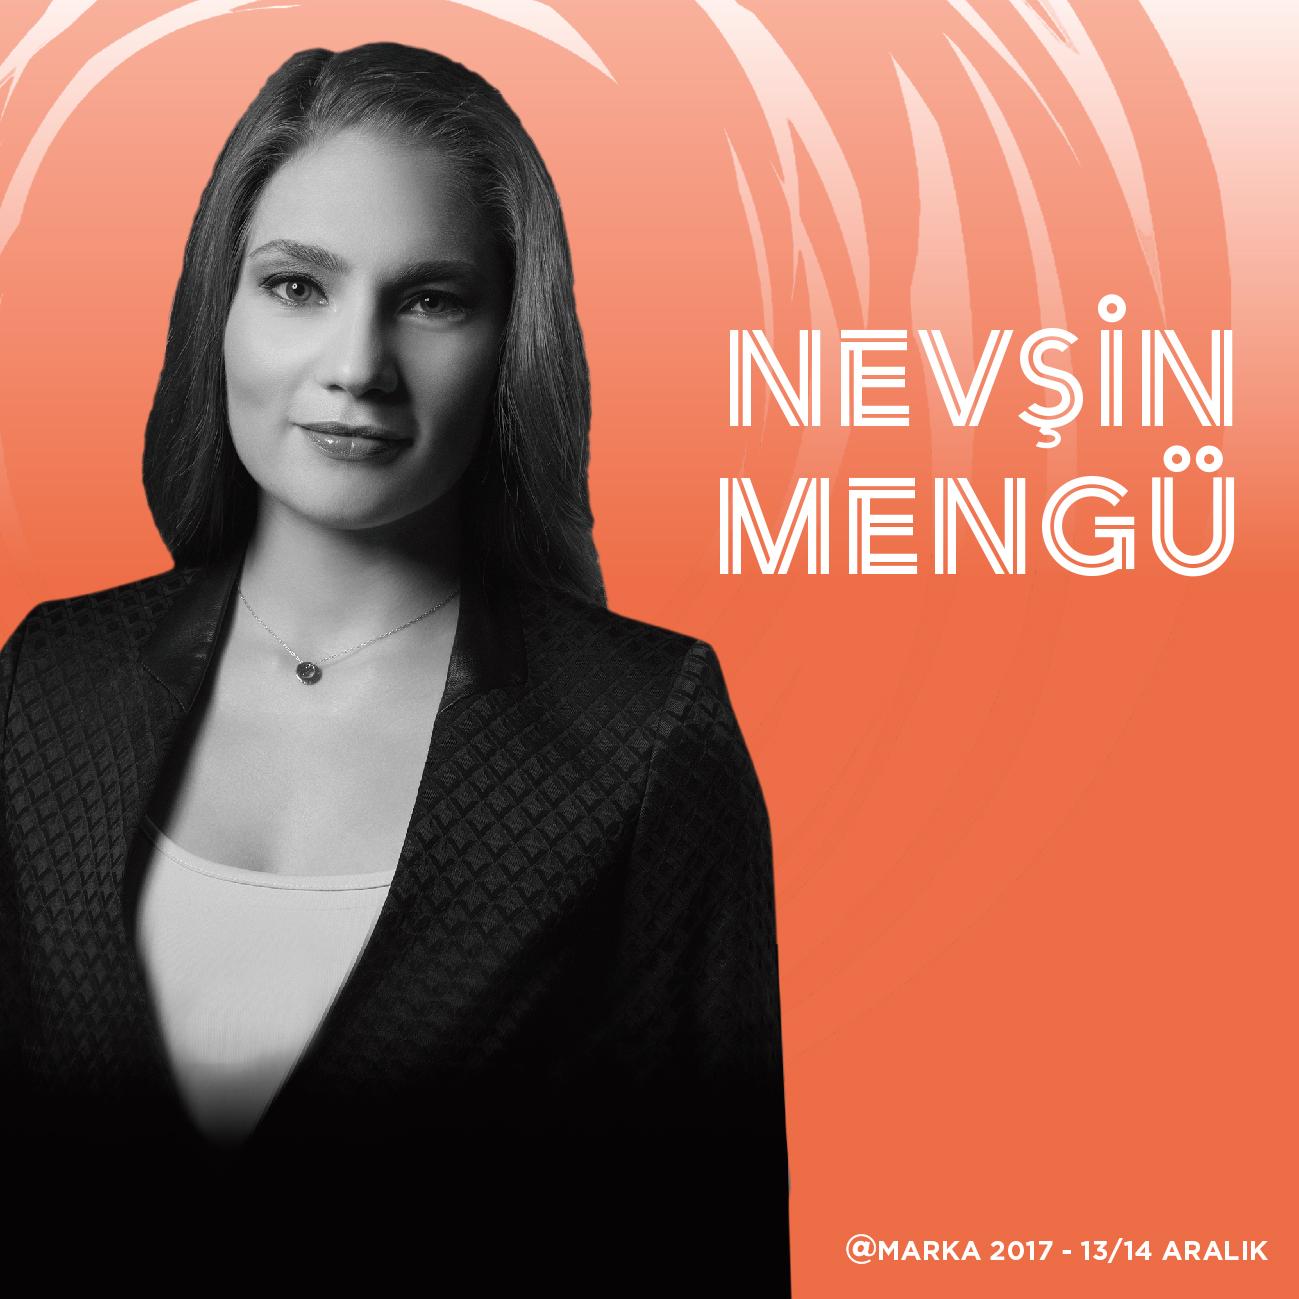 NEVSIN MENGU